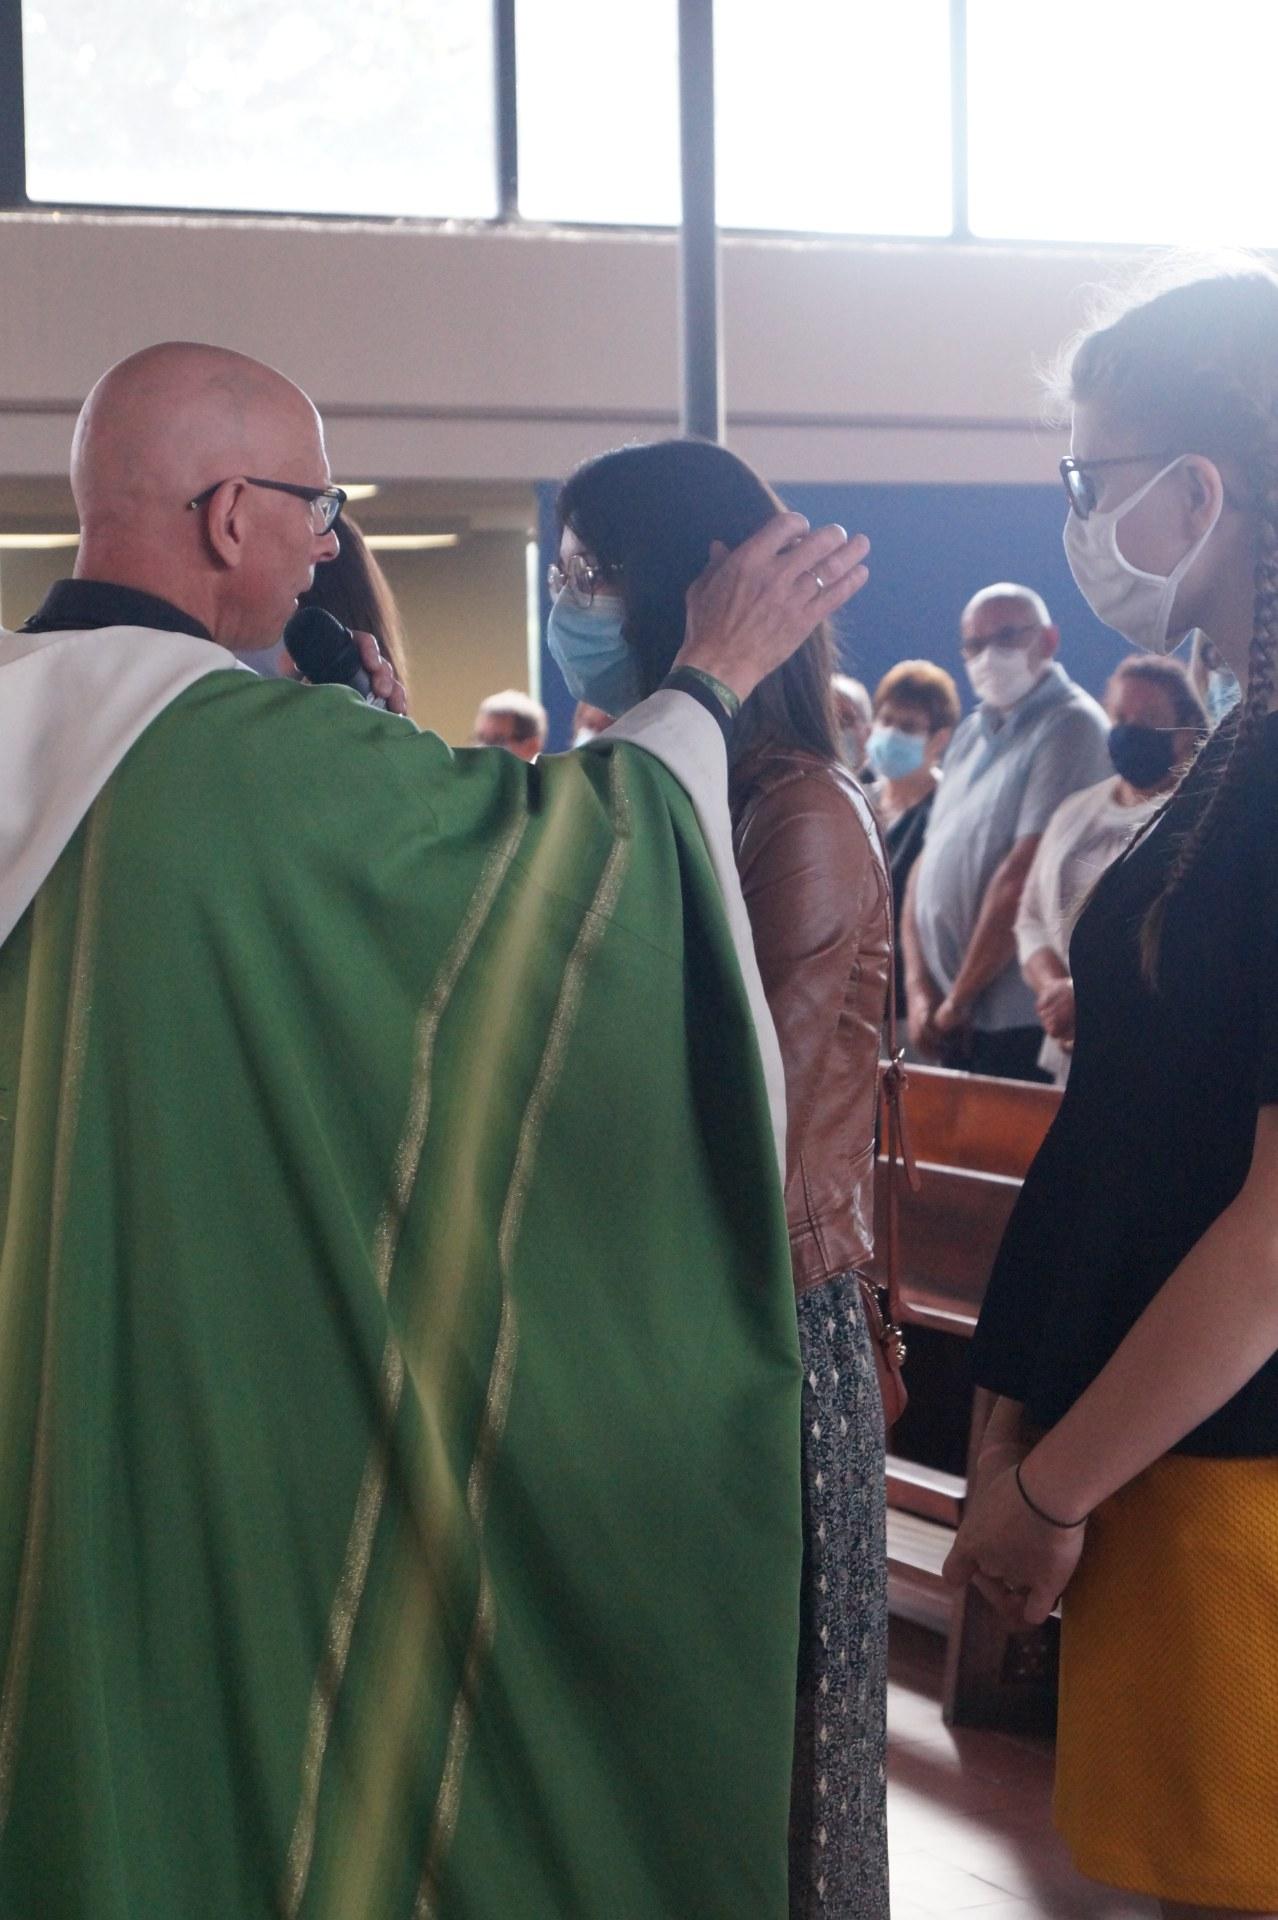 entree en catechumenat 6 sept 2020 (18)